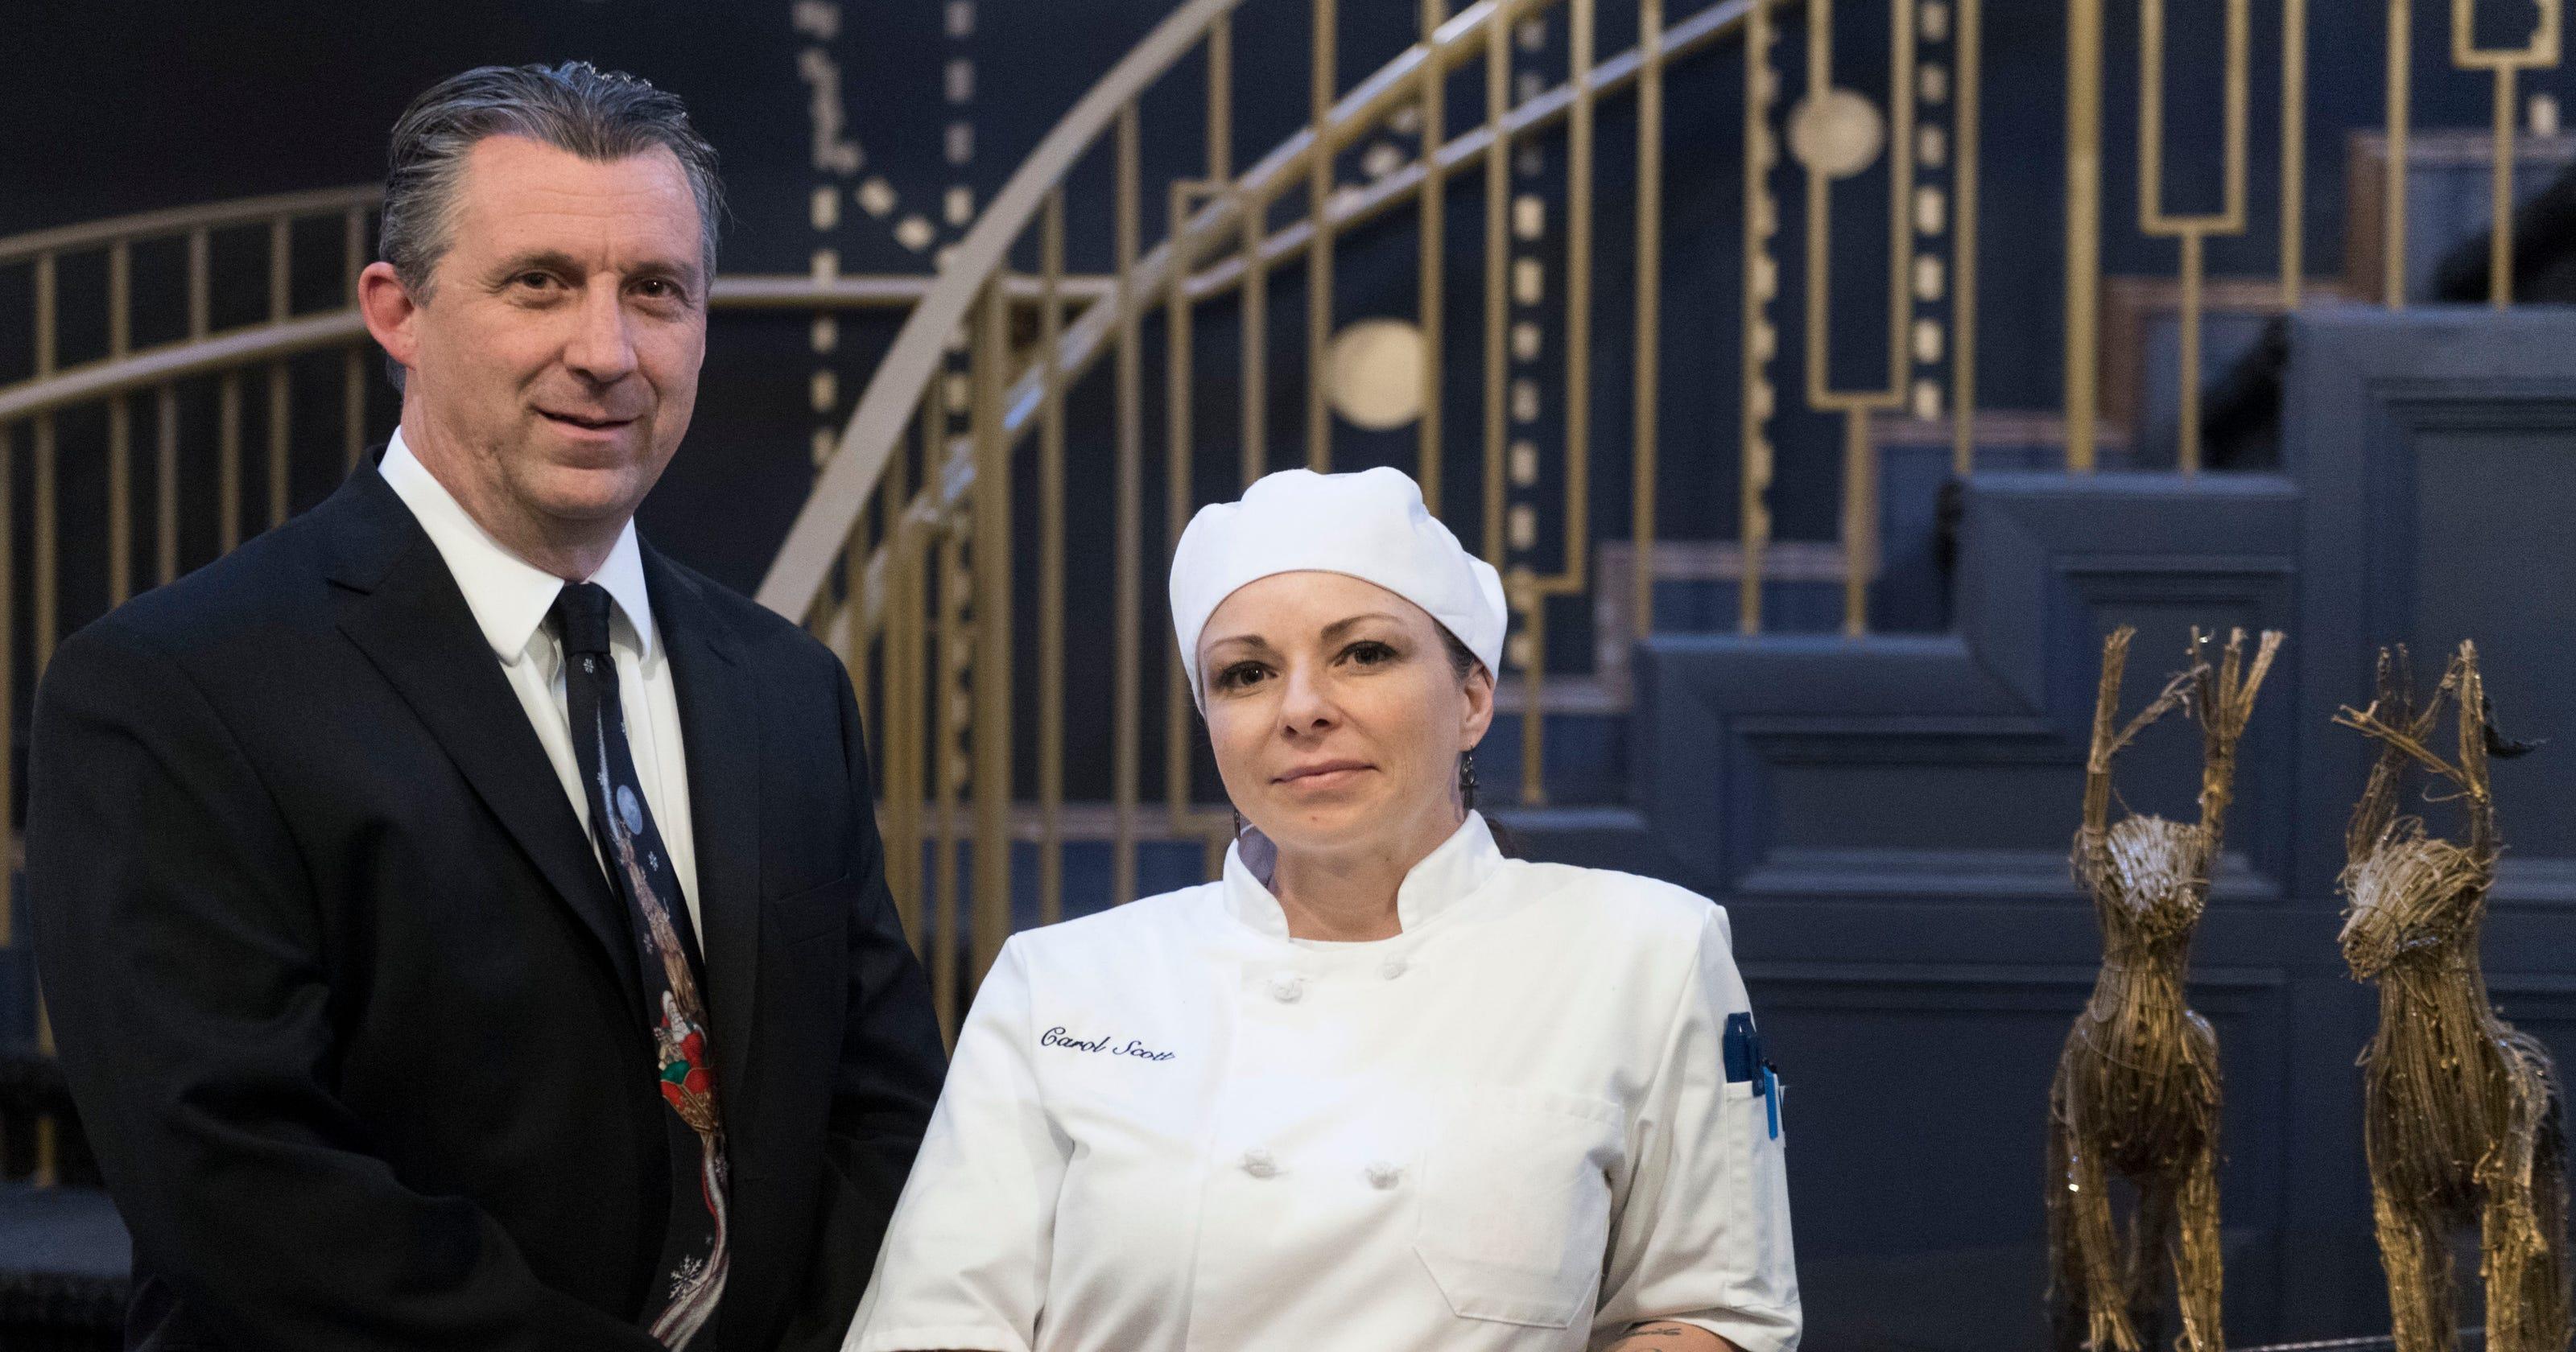 Kitchen 919 brings new life to former orangery restaurant